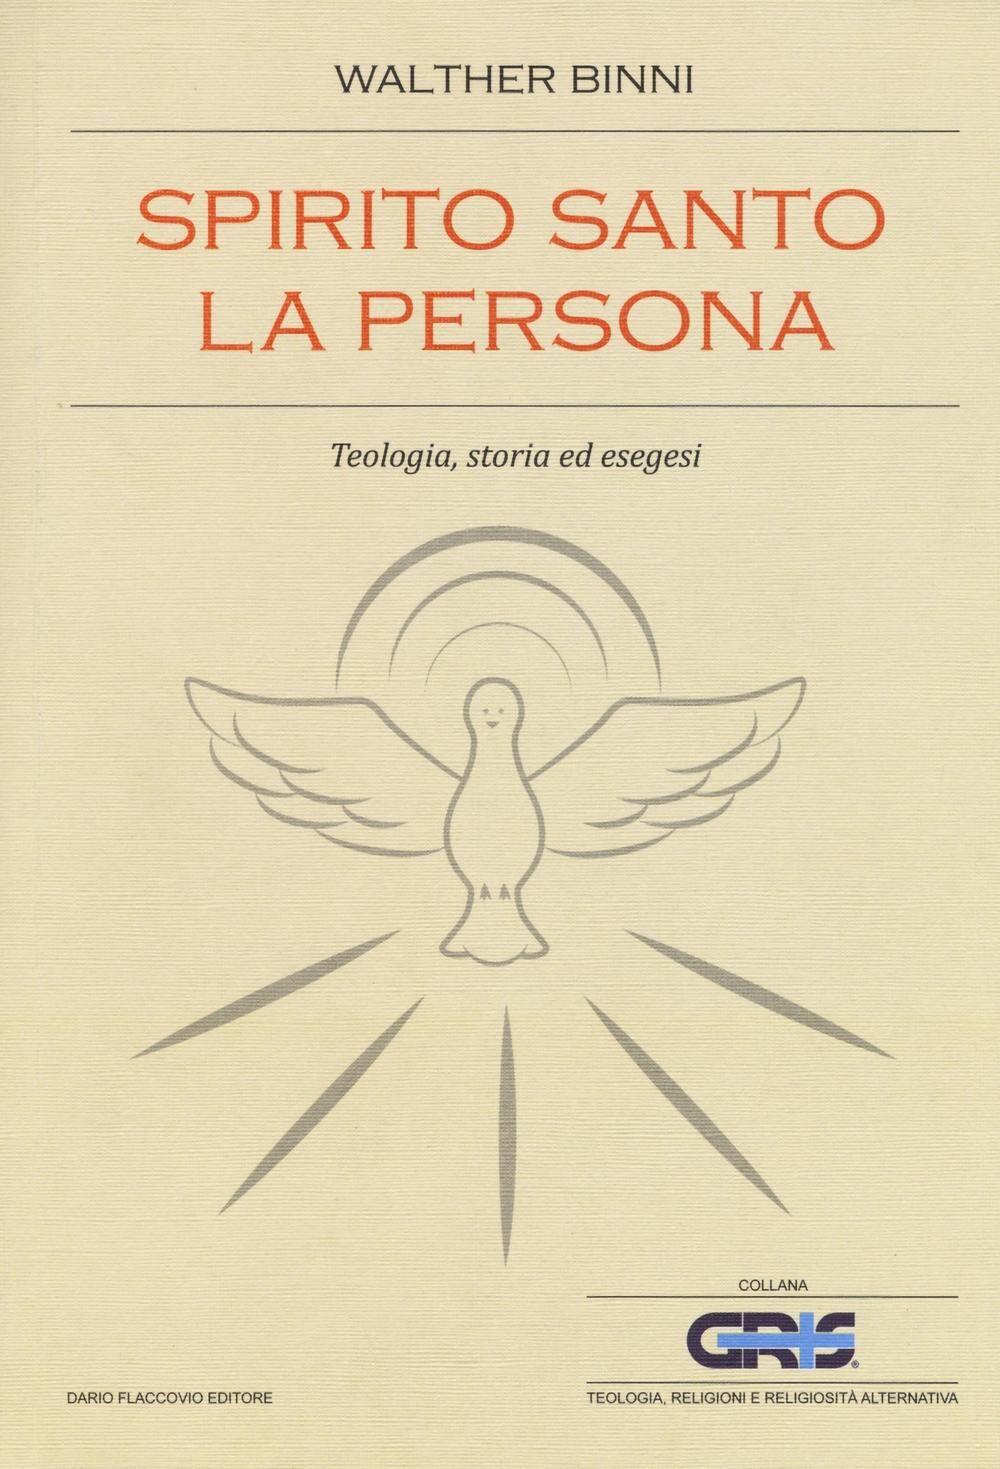 Spirito Santo, la persona. Teologia, storia ed esegesi